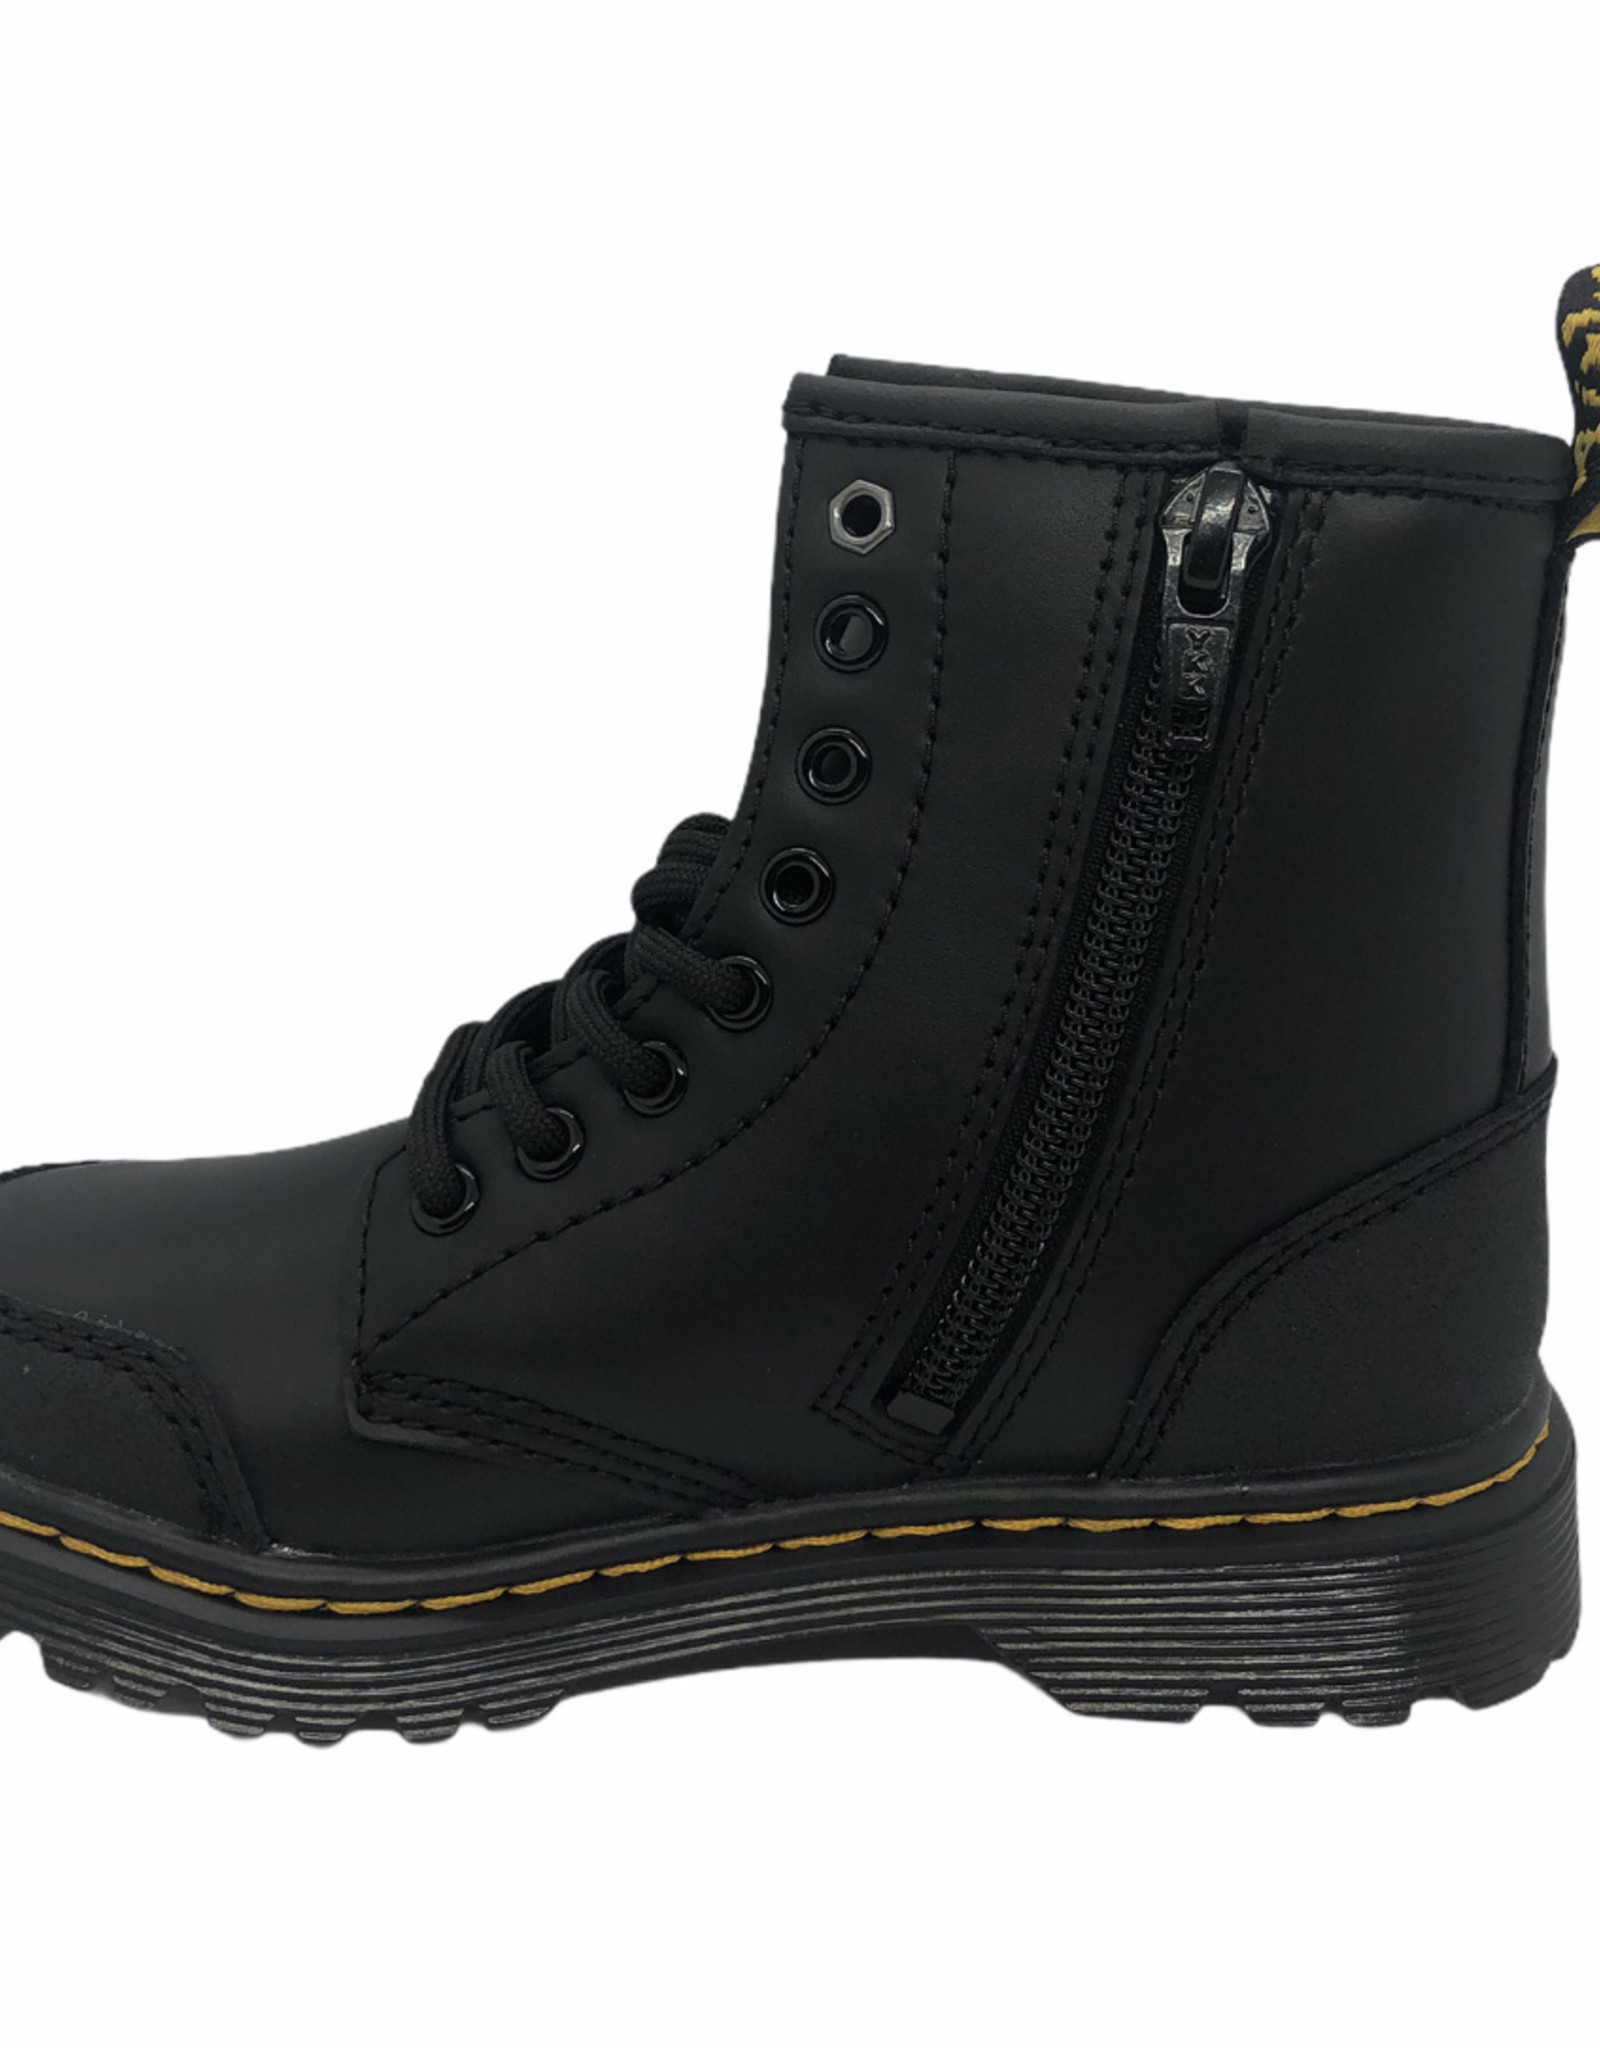 Dr Martens 1460 J black duty + romario